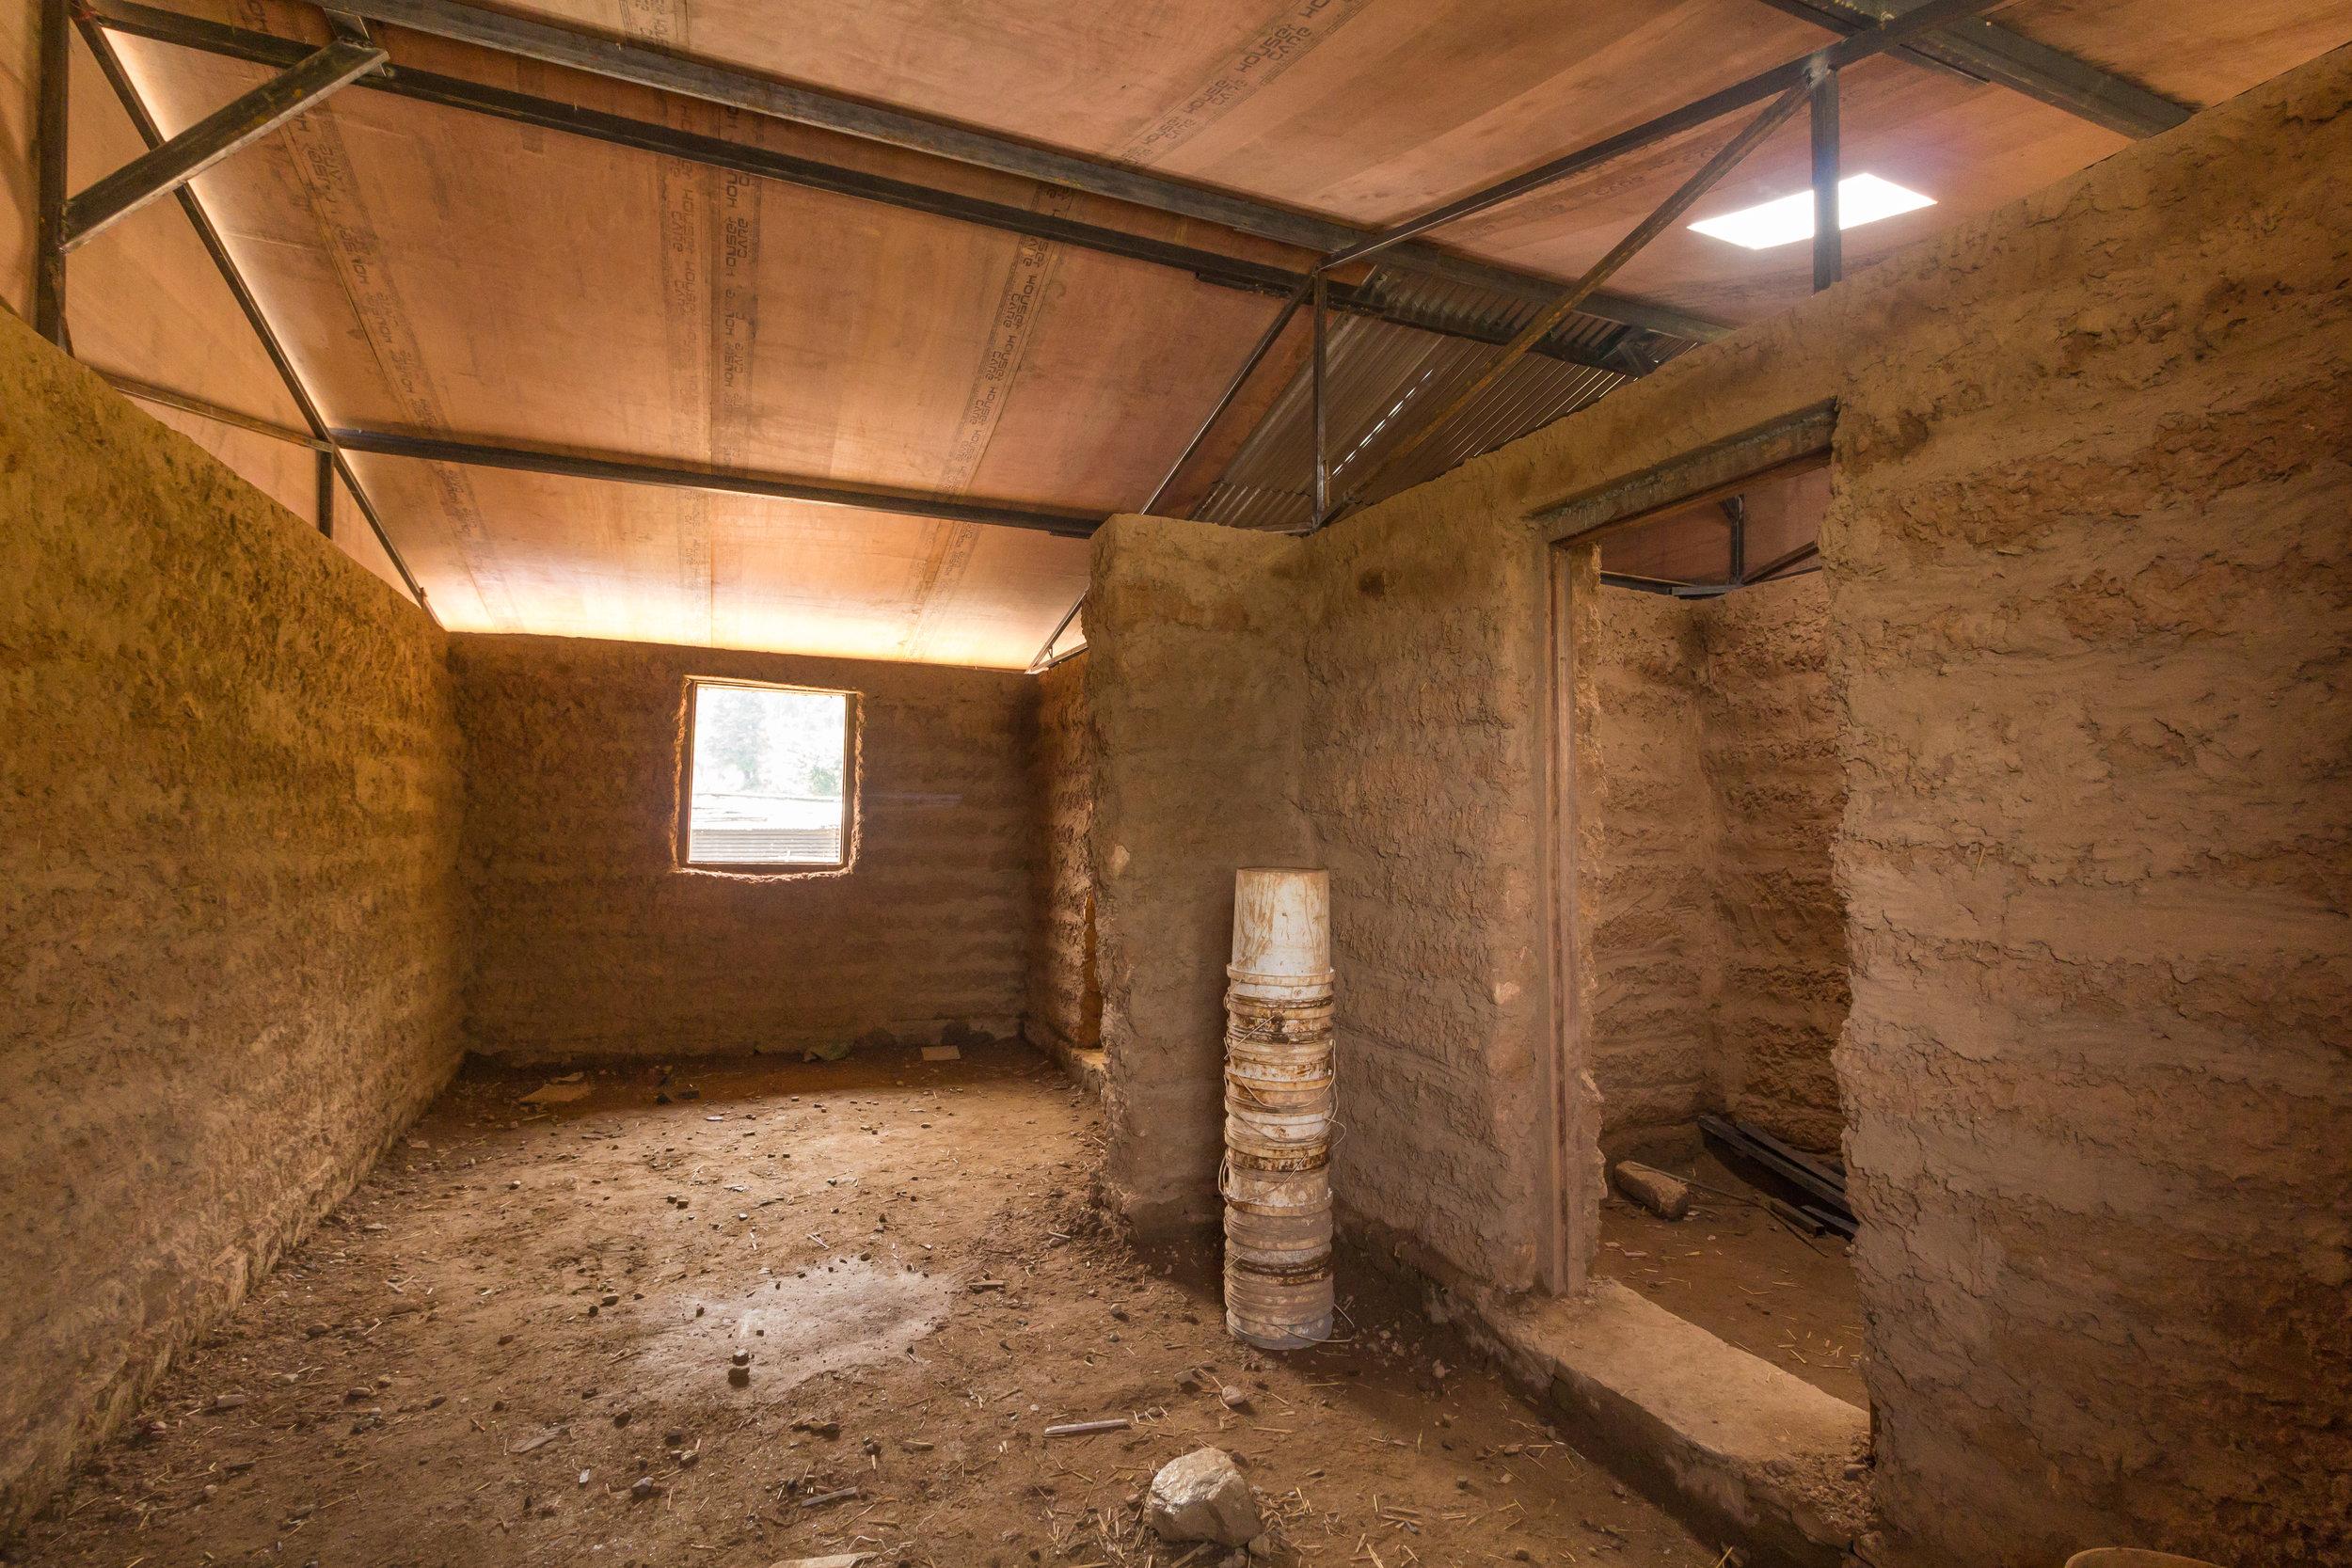 Sunita's Earthbag Home - Completed June 2017